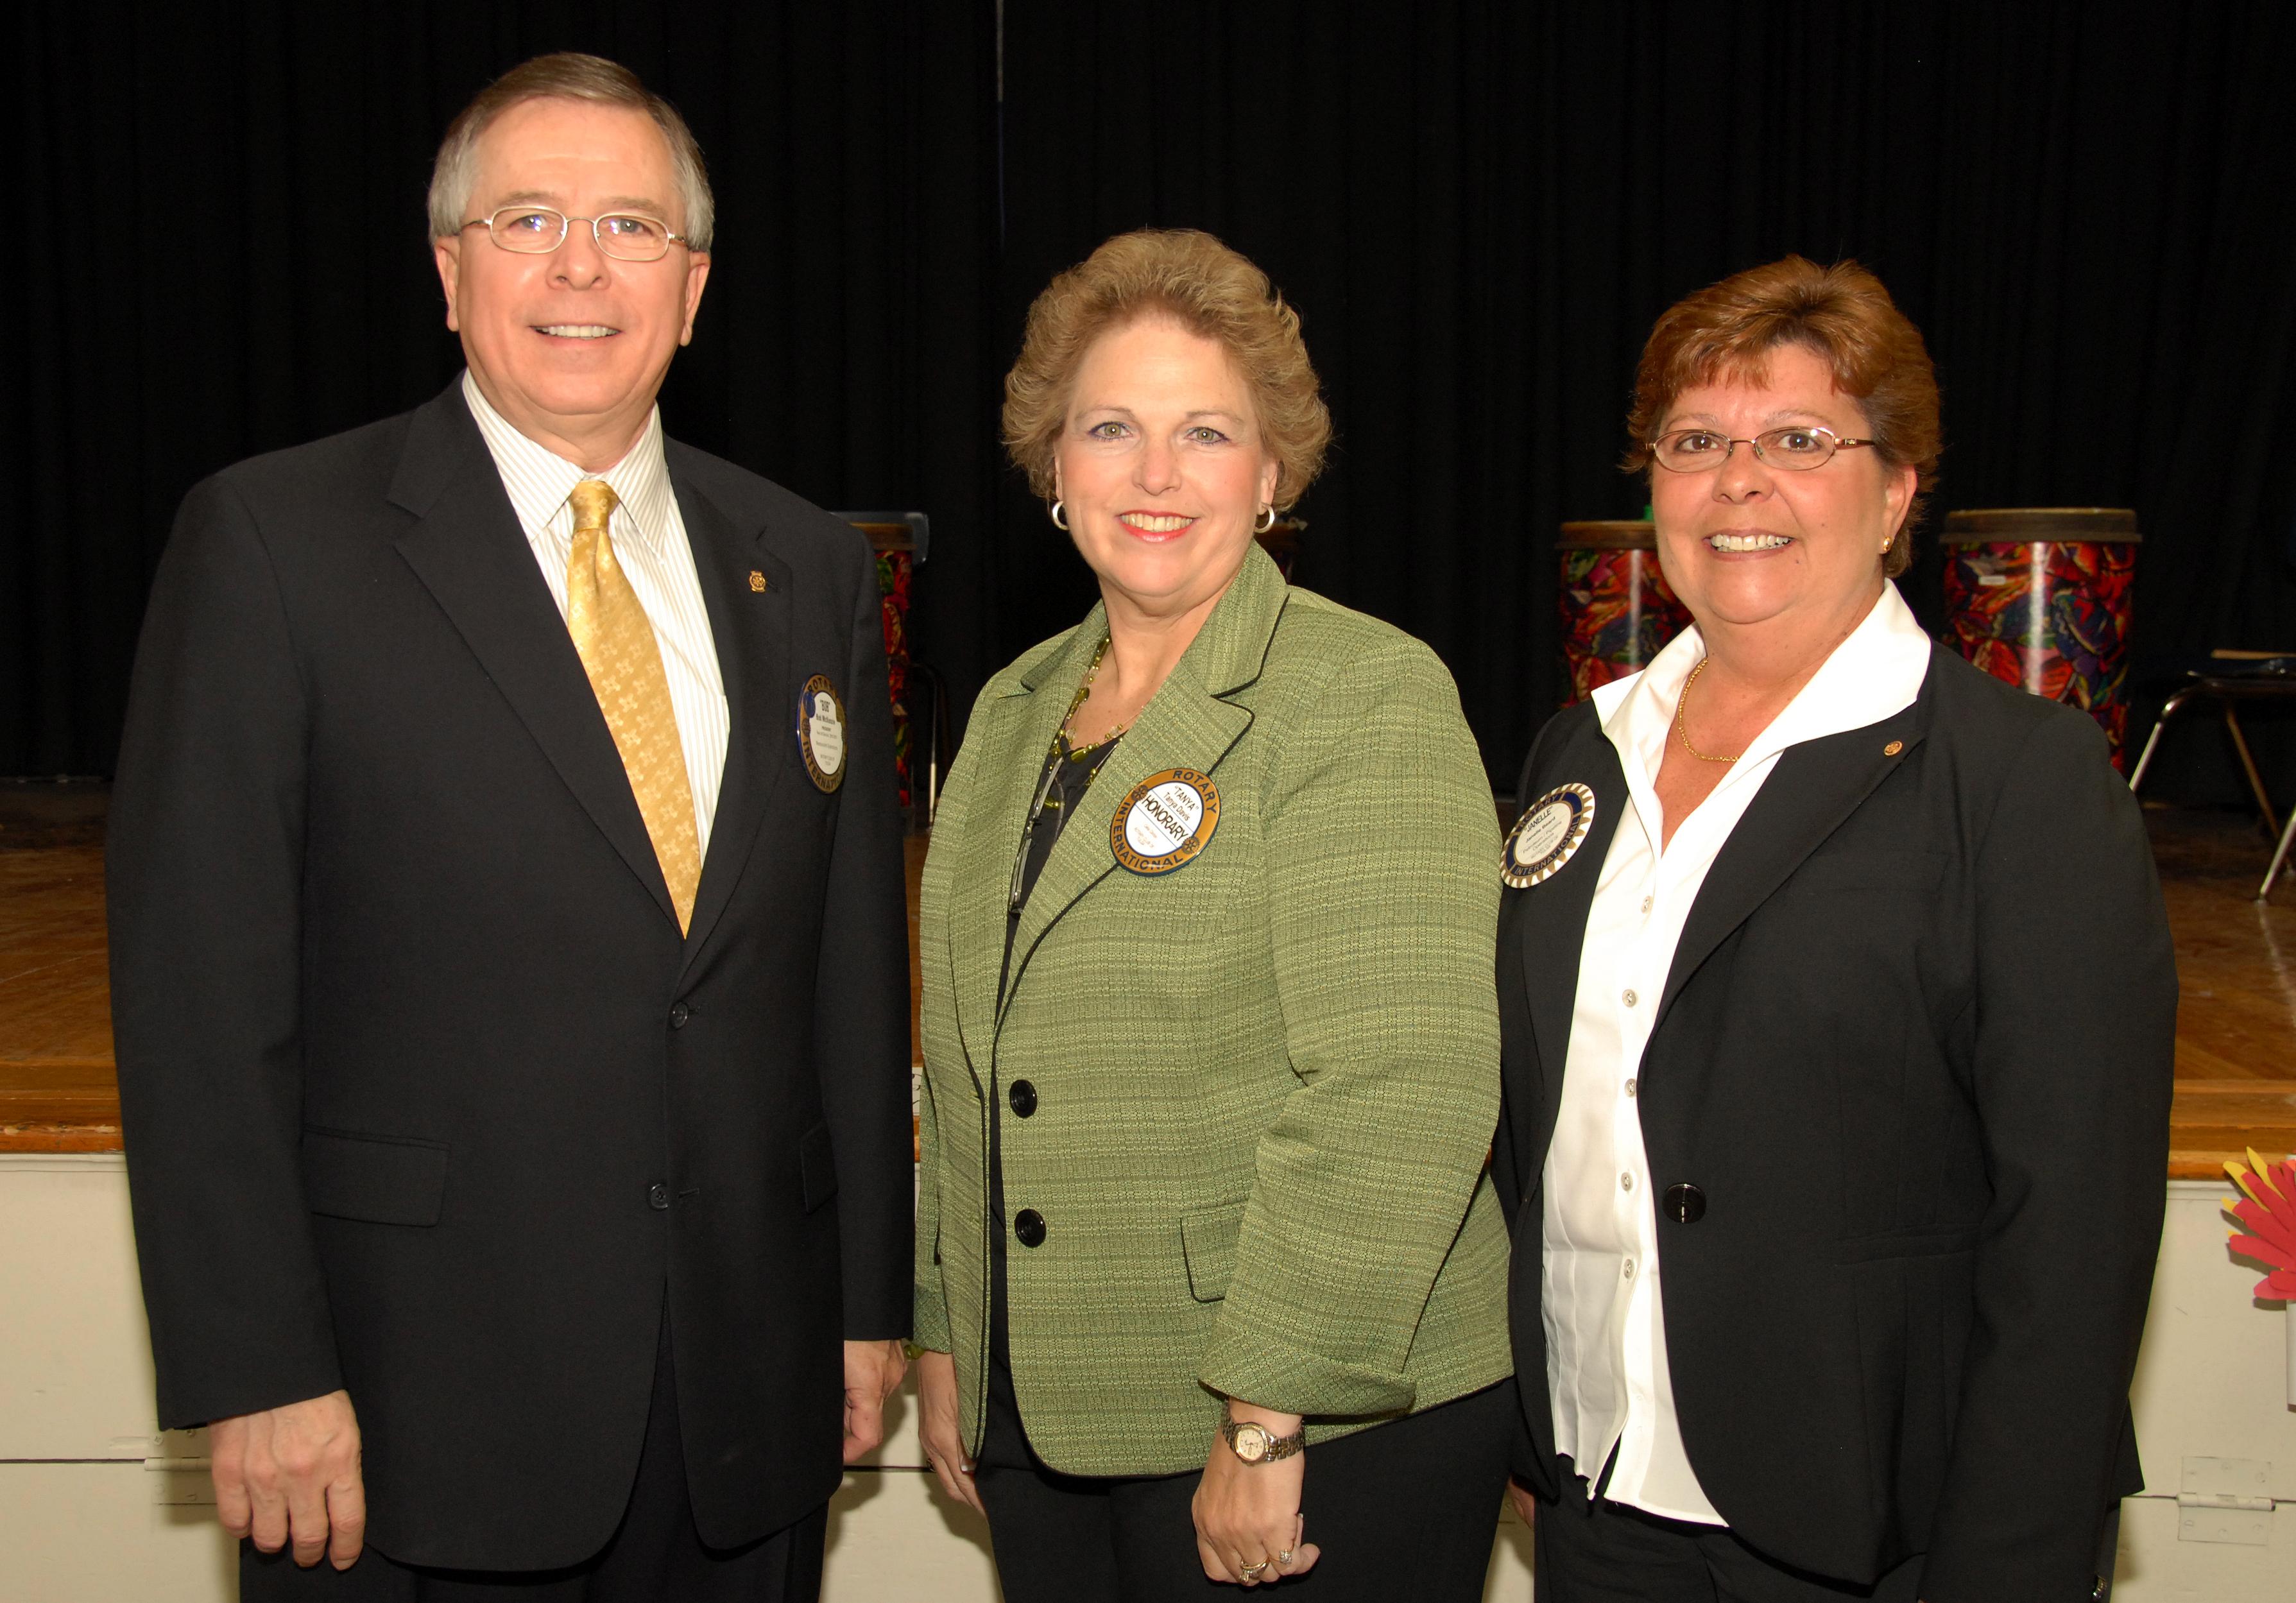 11-17-2010 - Tanya Davis, Celia Clinton Elementary School